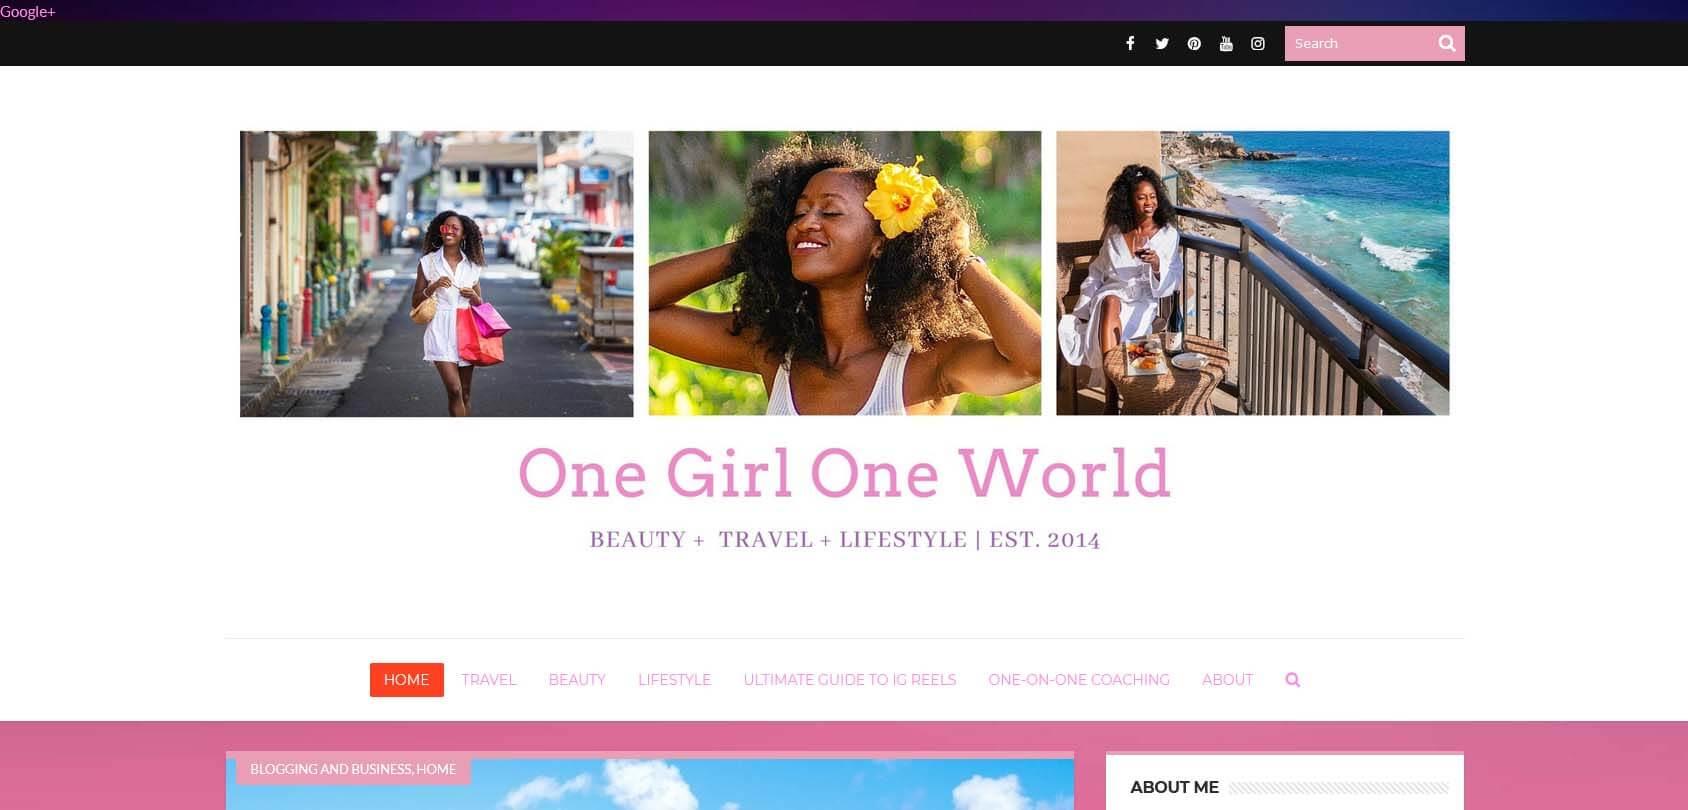 One Girl One World Homepage